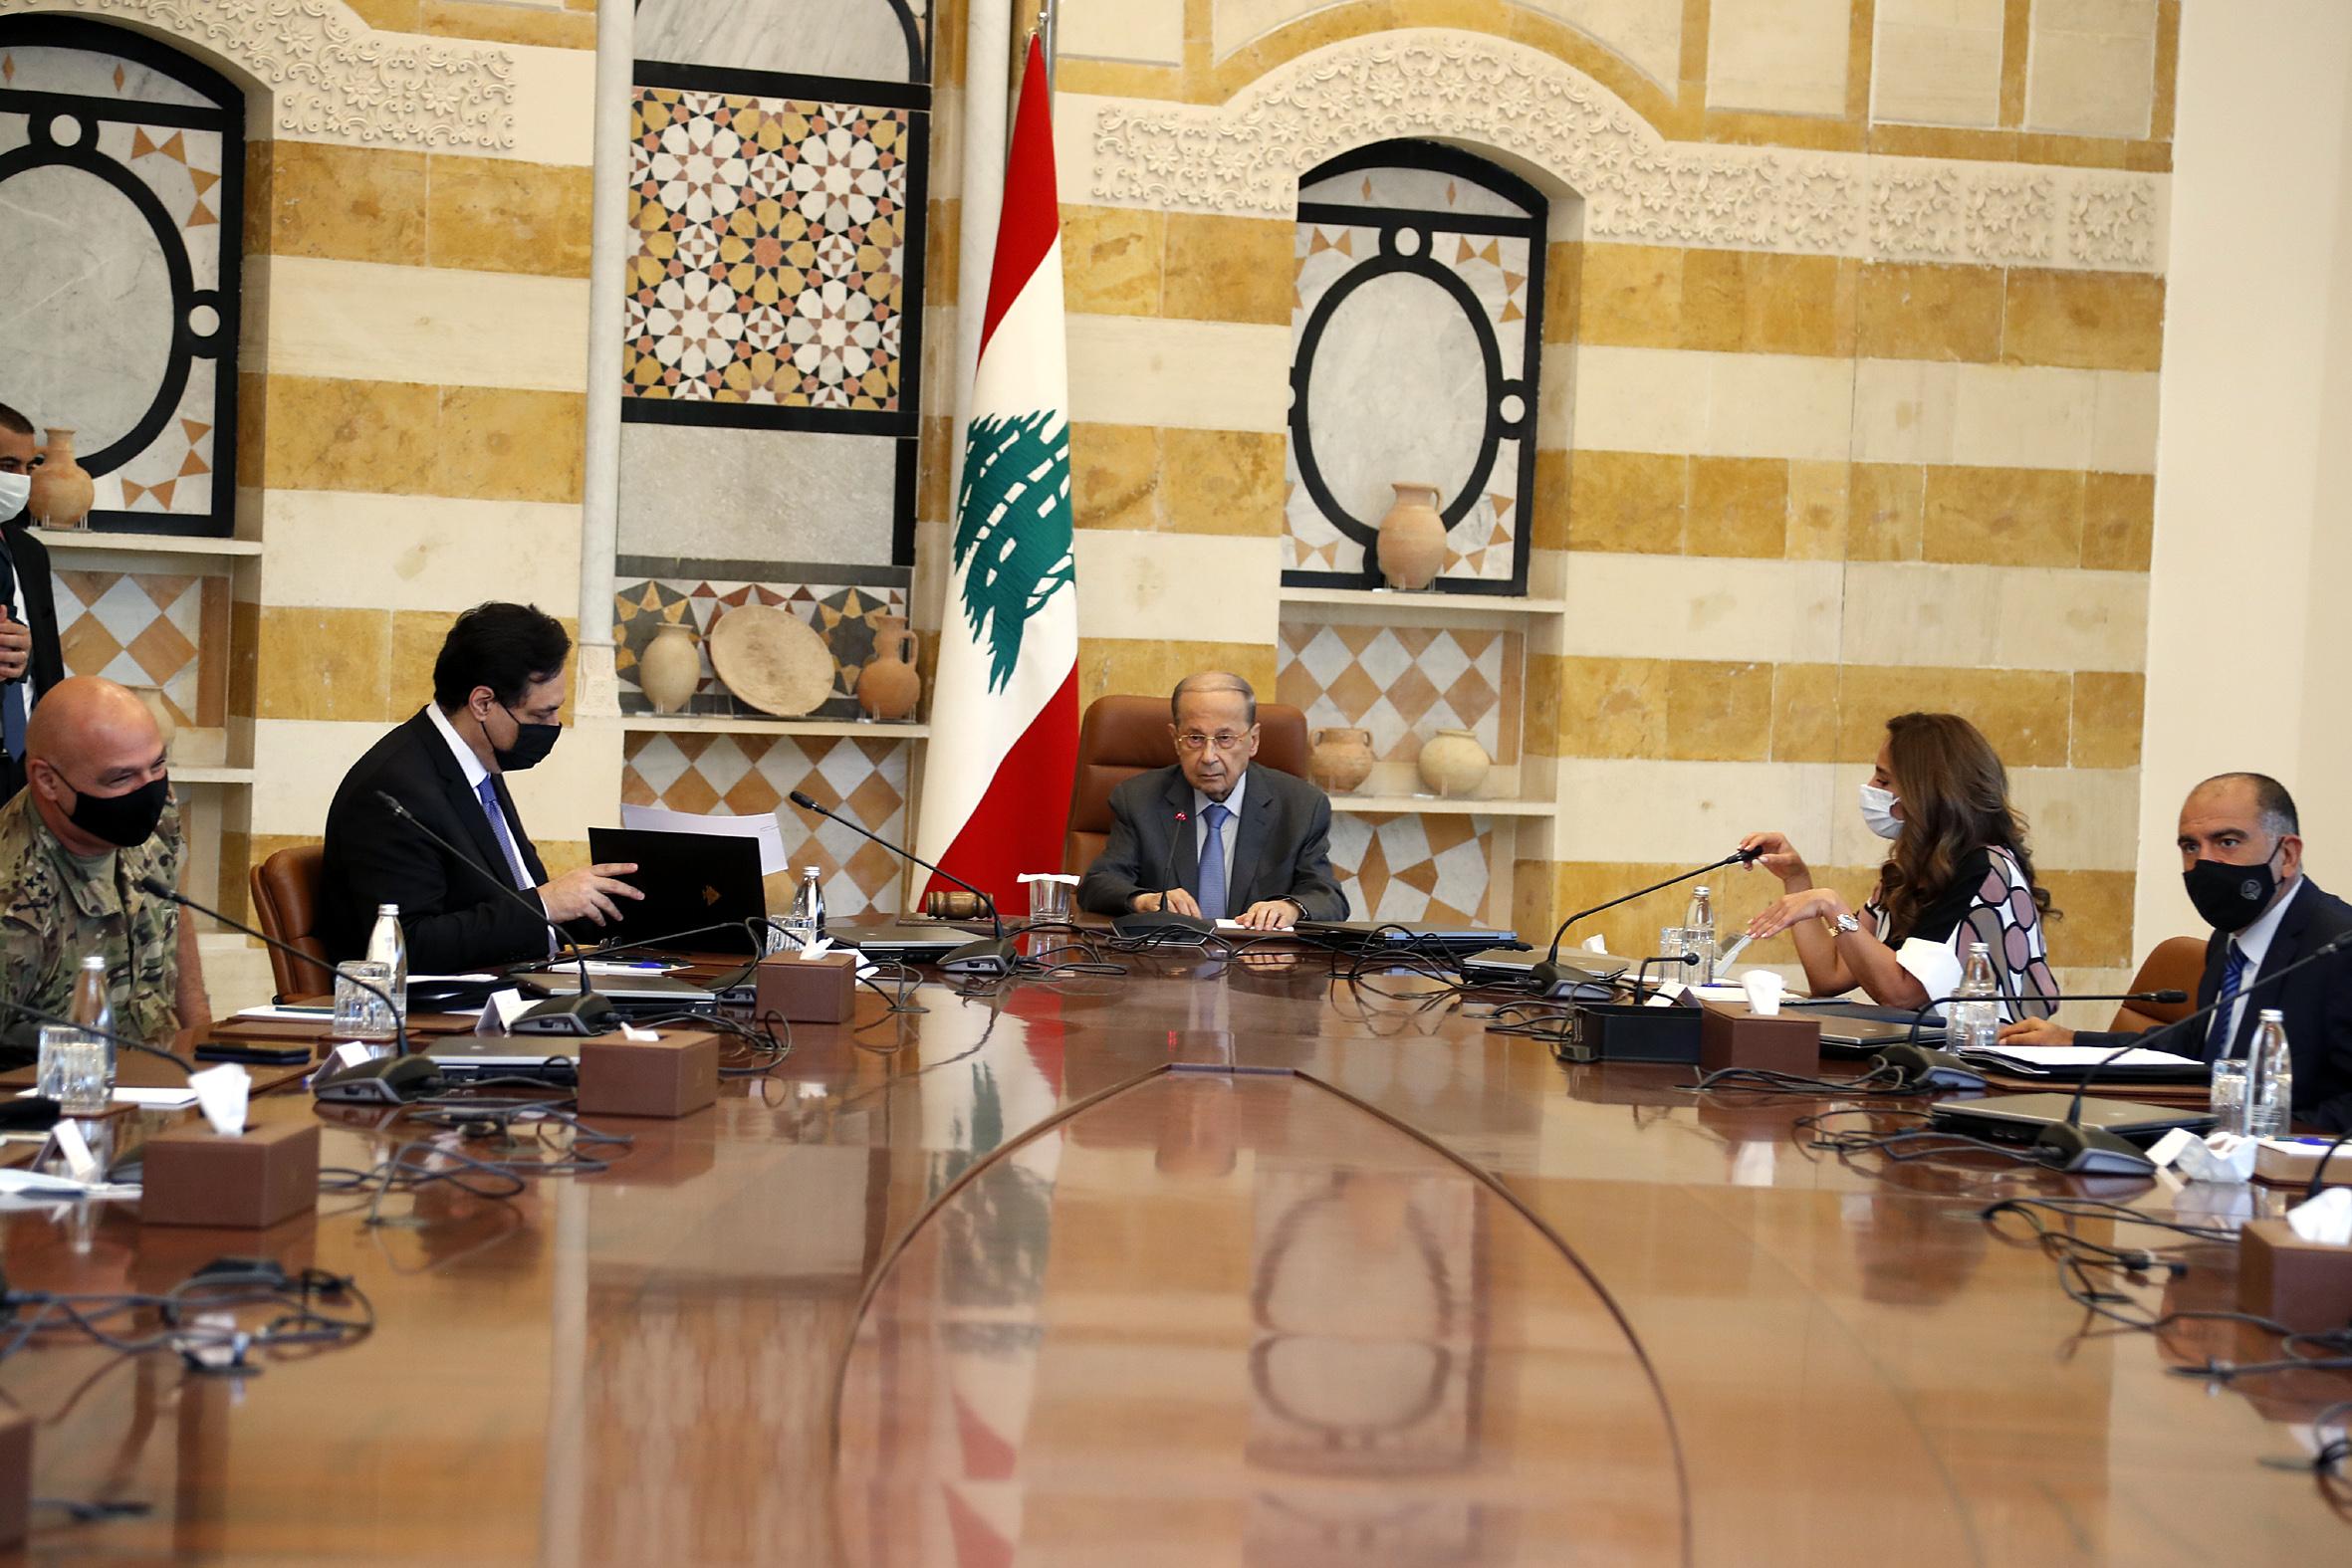 2 - Prime Minister Hassan Diab  1